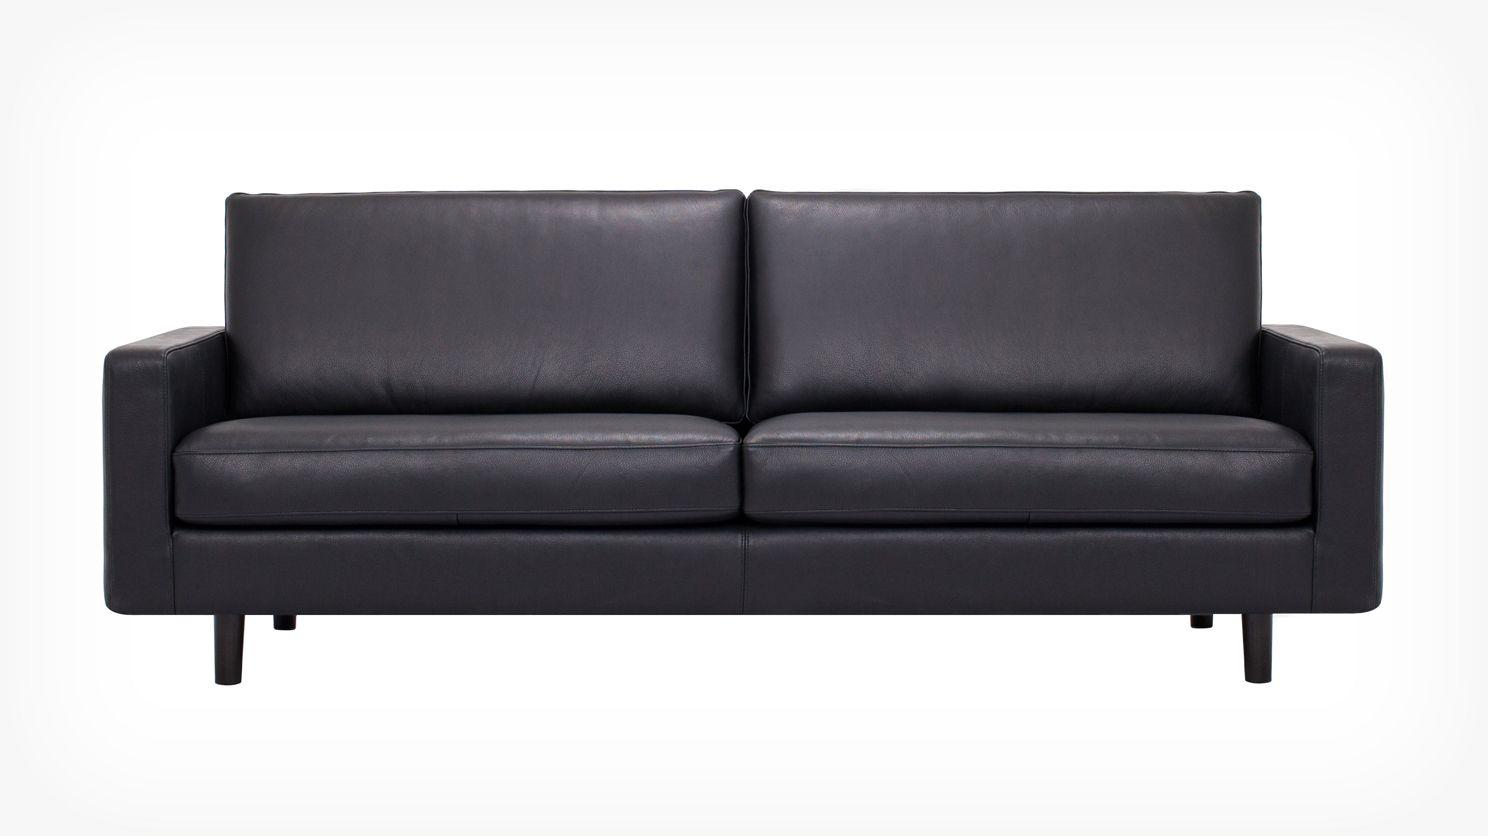 Oskar Sofa Eq3 Leather Sofa Sofa Custom Upholstery